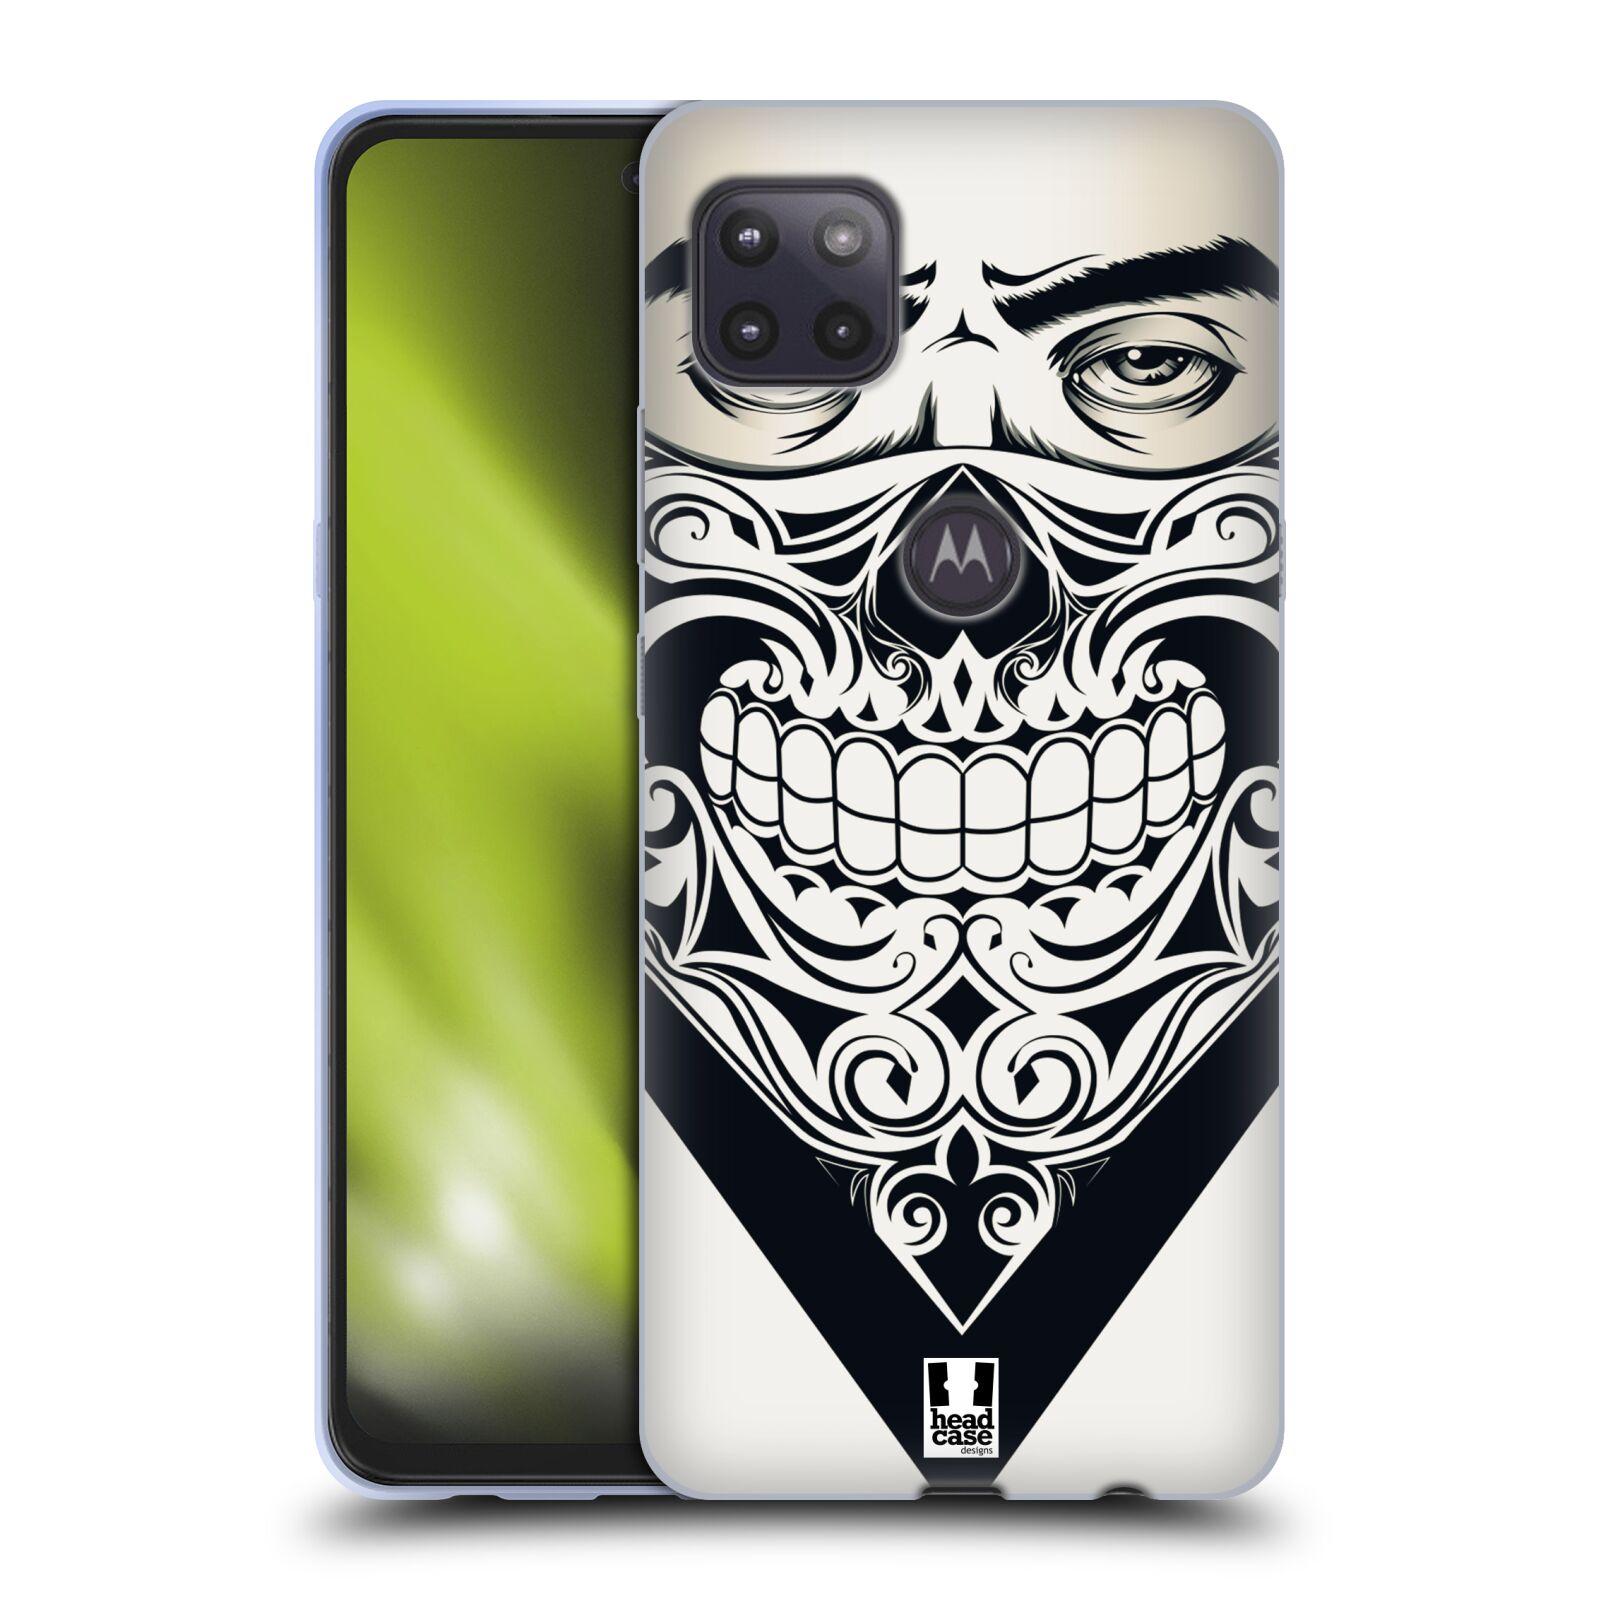 Silikonové pouzdro na mobil Motorola Moto G 5G - Head Case - LEBKA BANDANA